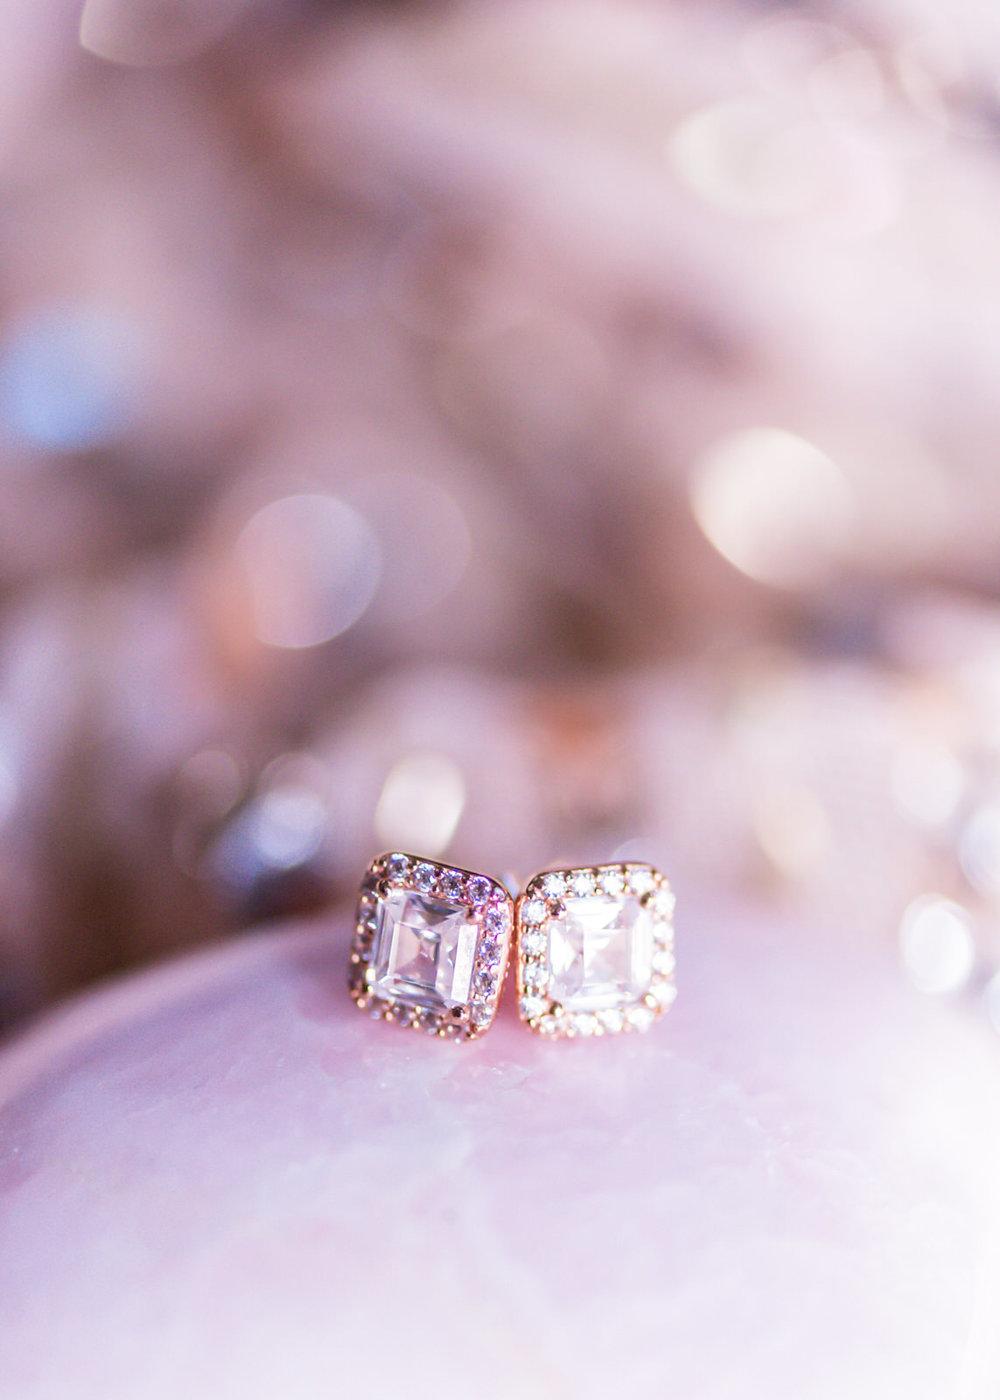 Diamond Stud Earrings Tiffanys Seattle Wedding Woodinville Bride Gift.jpg